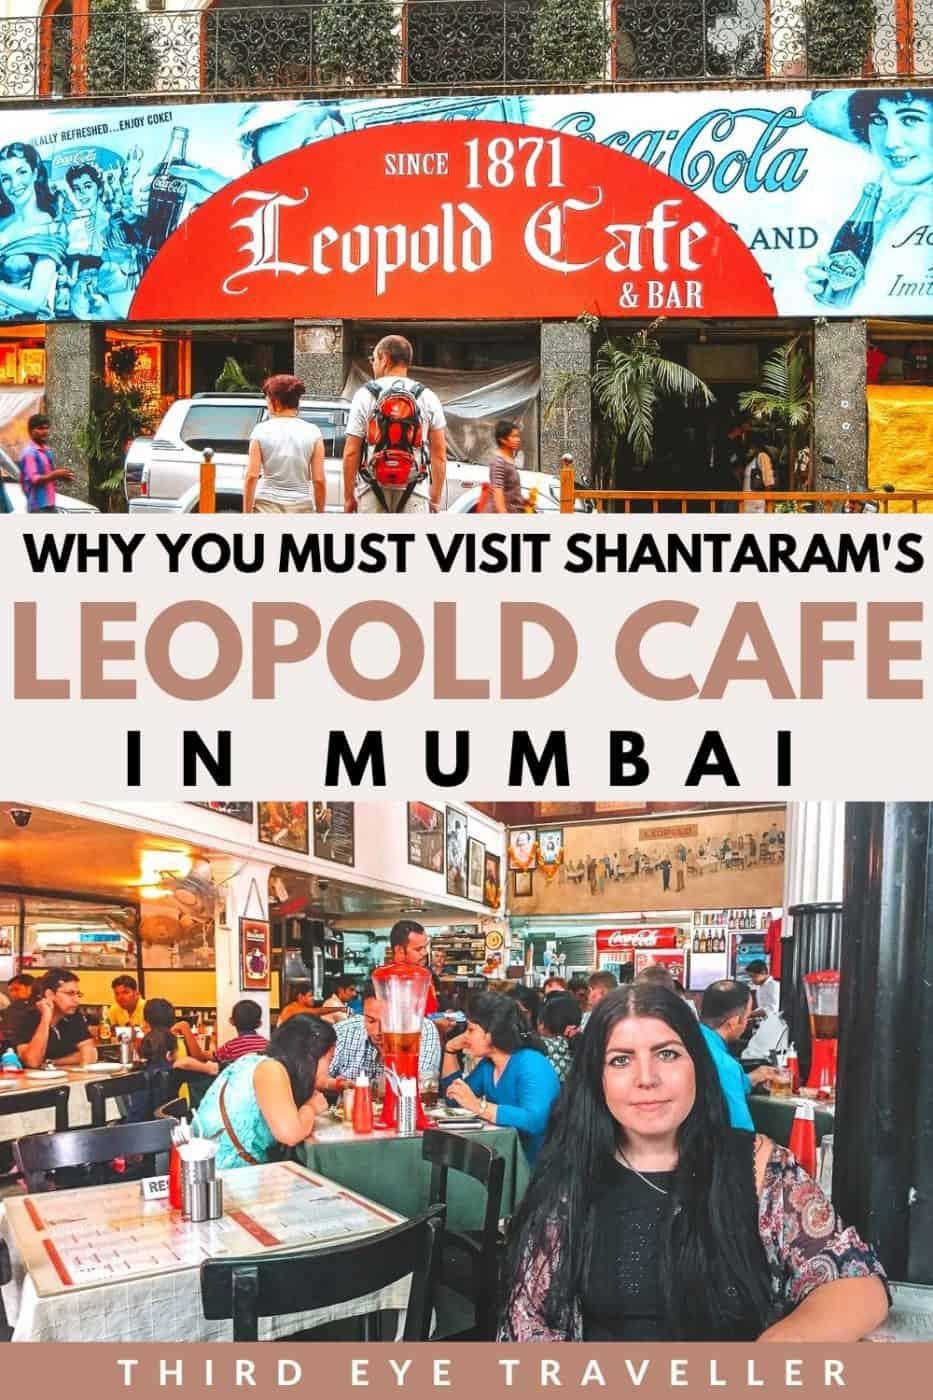 Shantaram Leopold Cafe in Mumbai